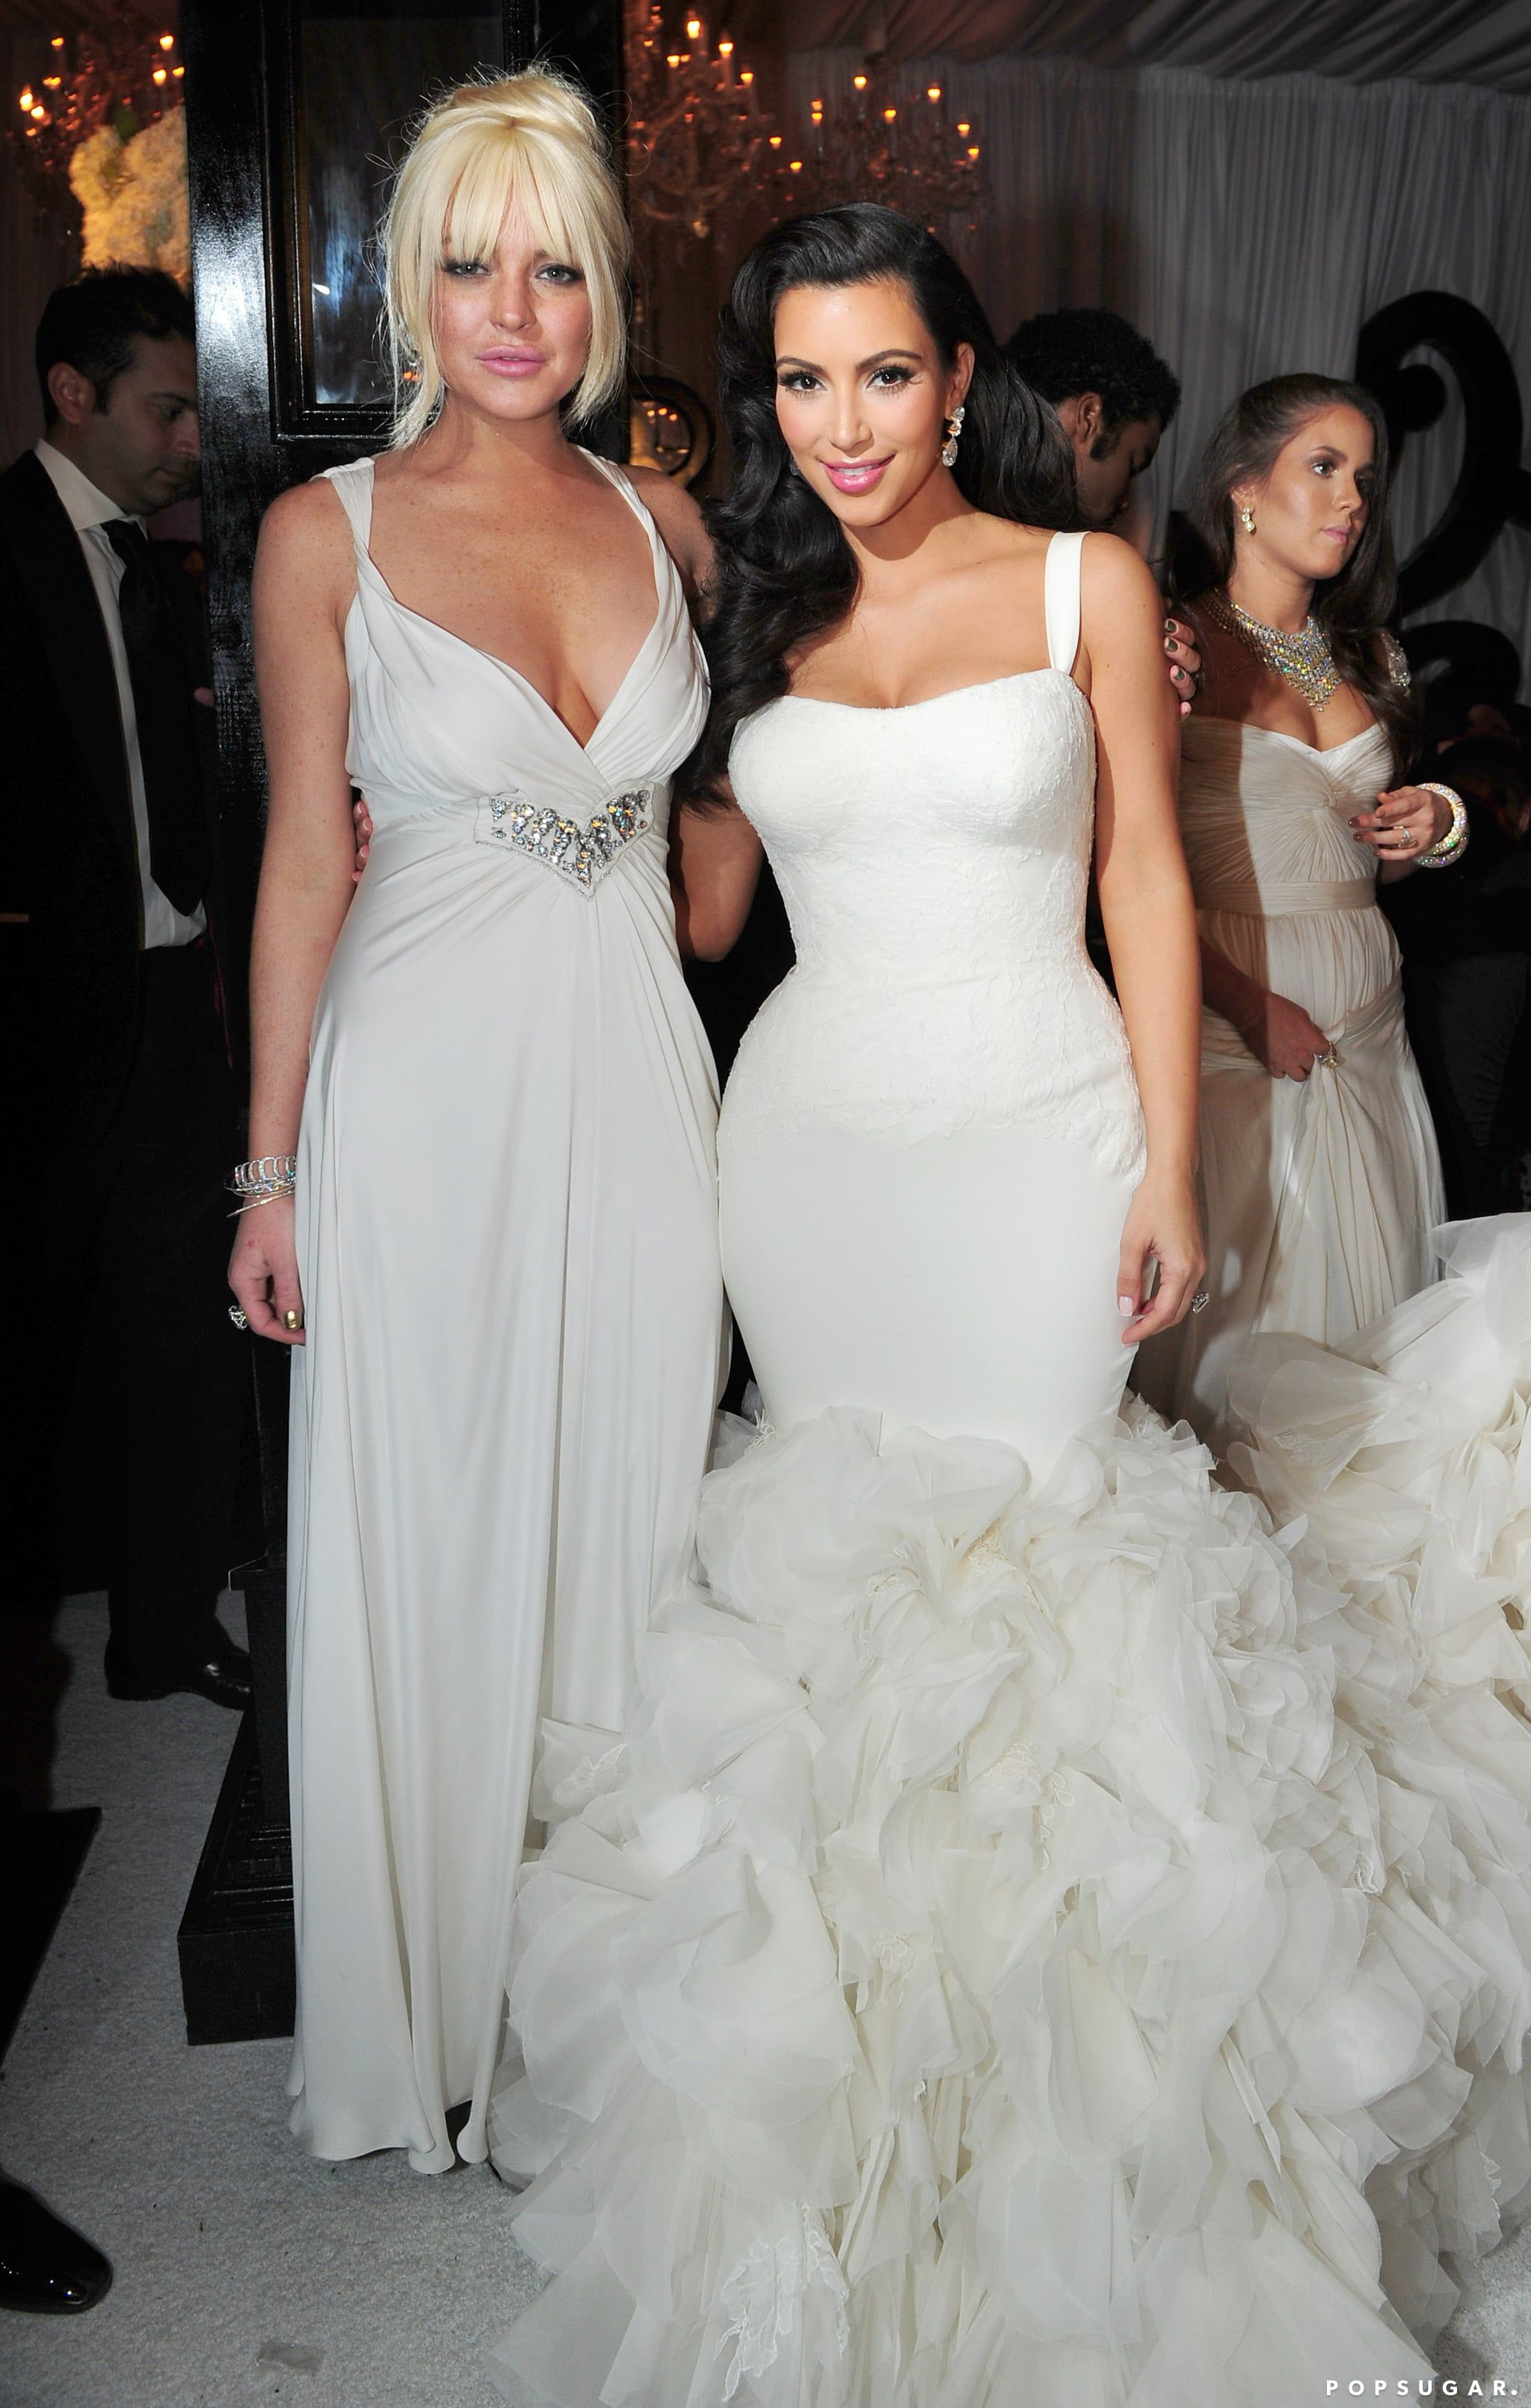 Before Kim Marries Kanye Take A Look Back At That Other Wedding She Had Kim Kardashian Wedding Dress Kim Kardashian Wedding Kardashian Wedding [ 3222 x 2048 Pixel ]